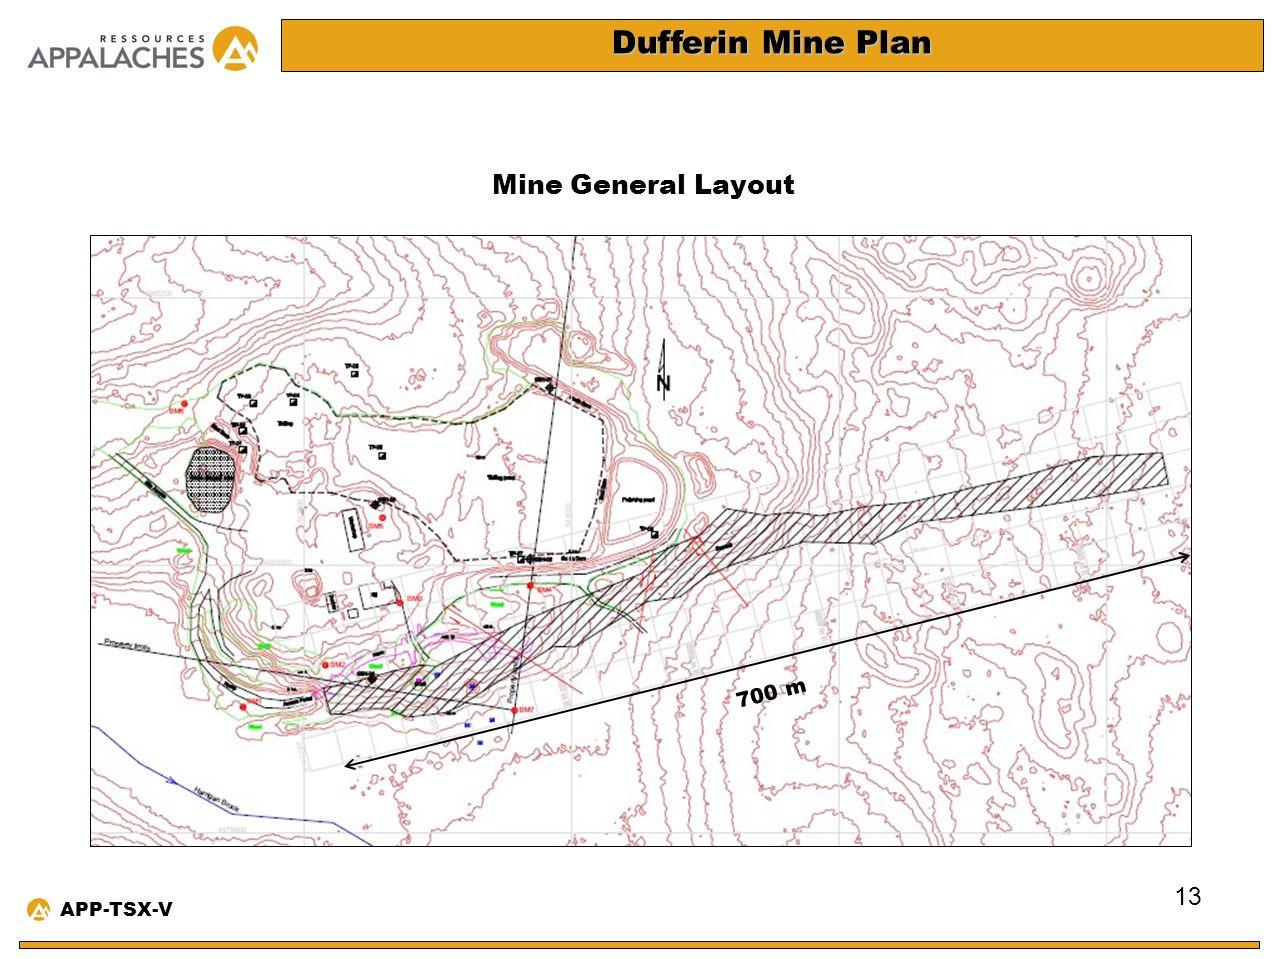 Dufferin Mine Plan Mine General Layout 13 APP-TSX-V 700 m